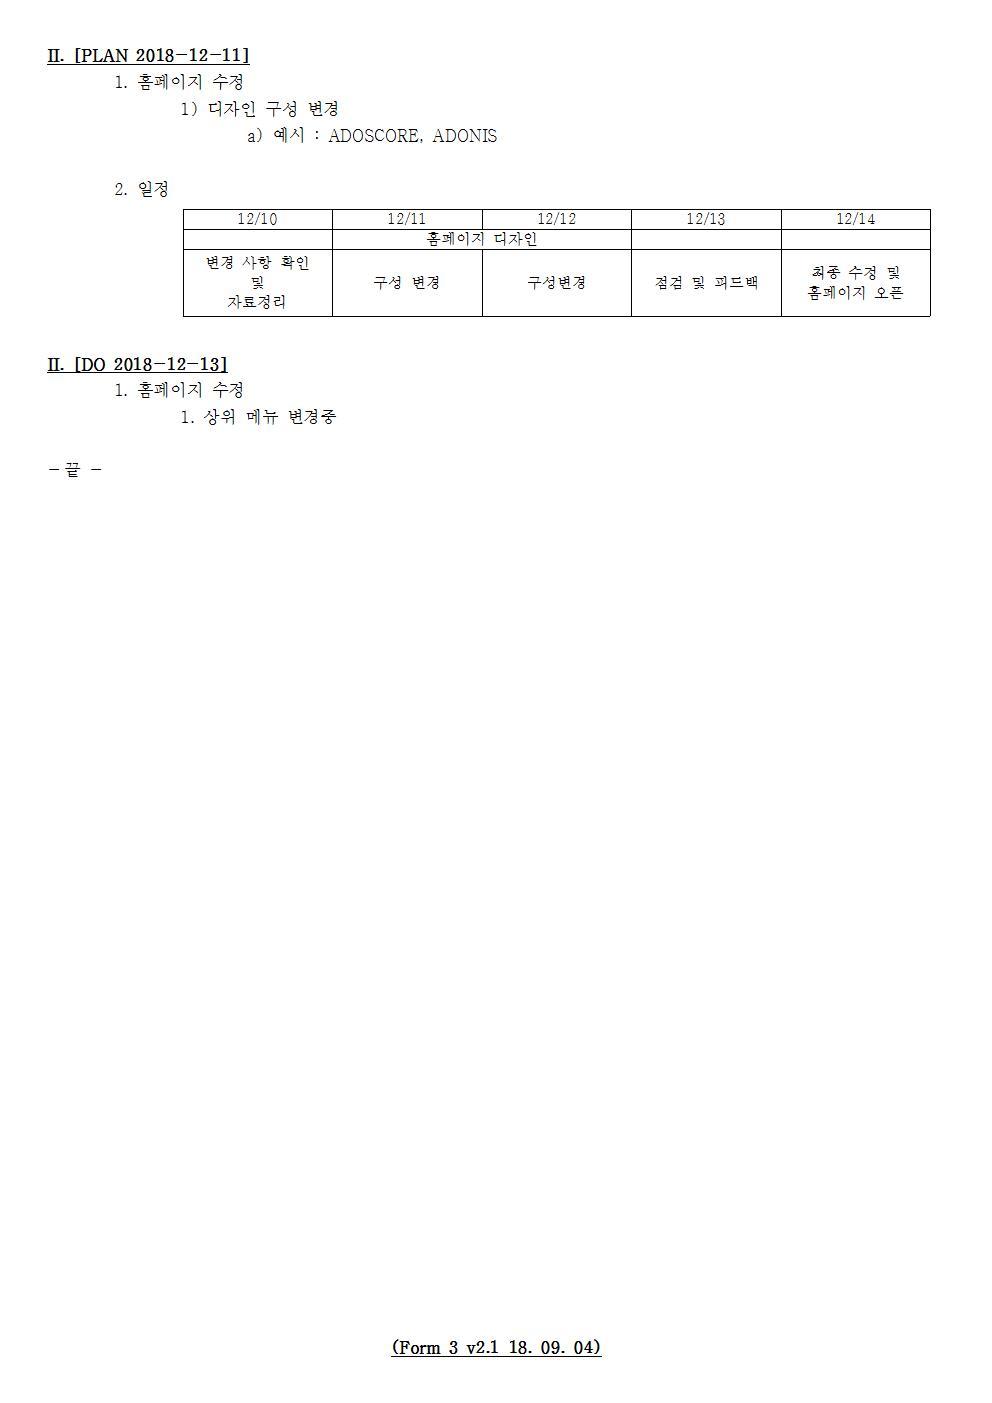 D-[18-047-BZ-07]-[BZEN HP v3.0]-[2018-12-13][HH]002.jpg